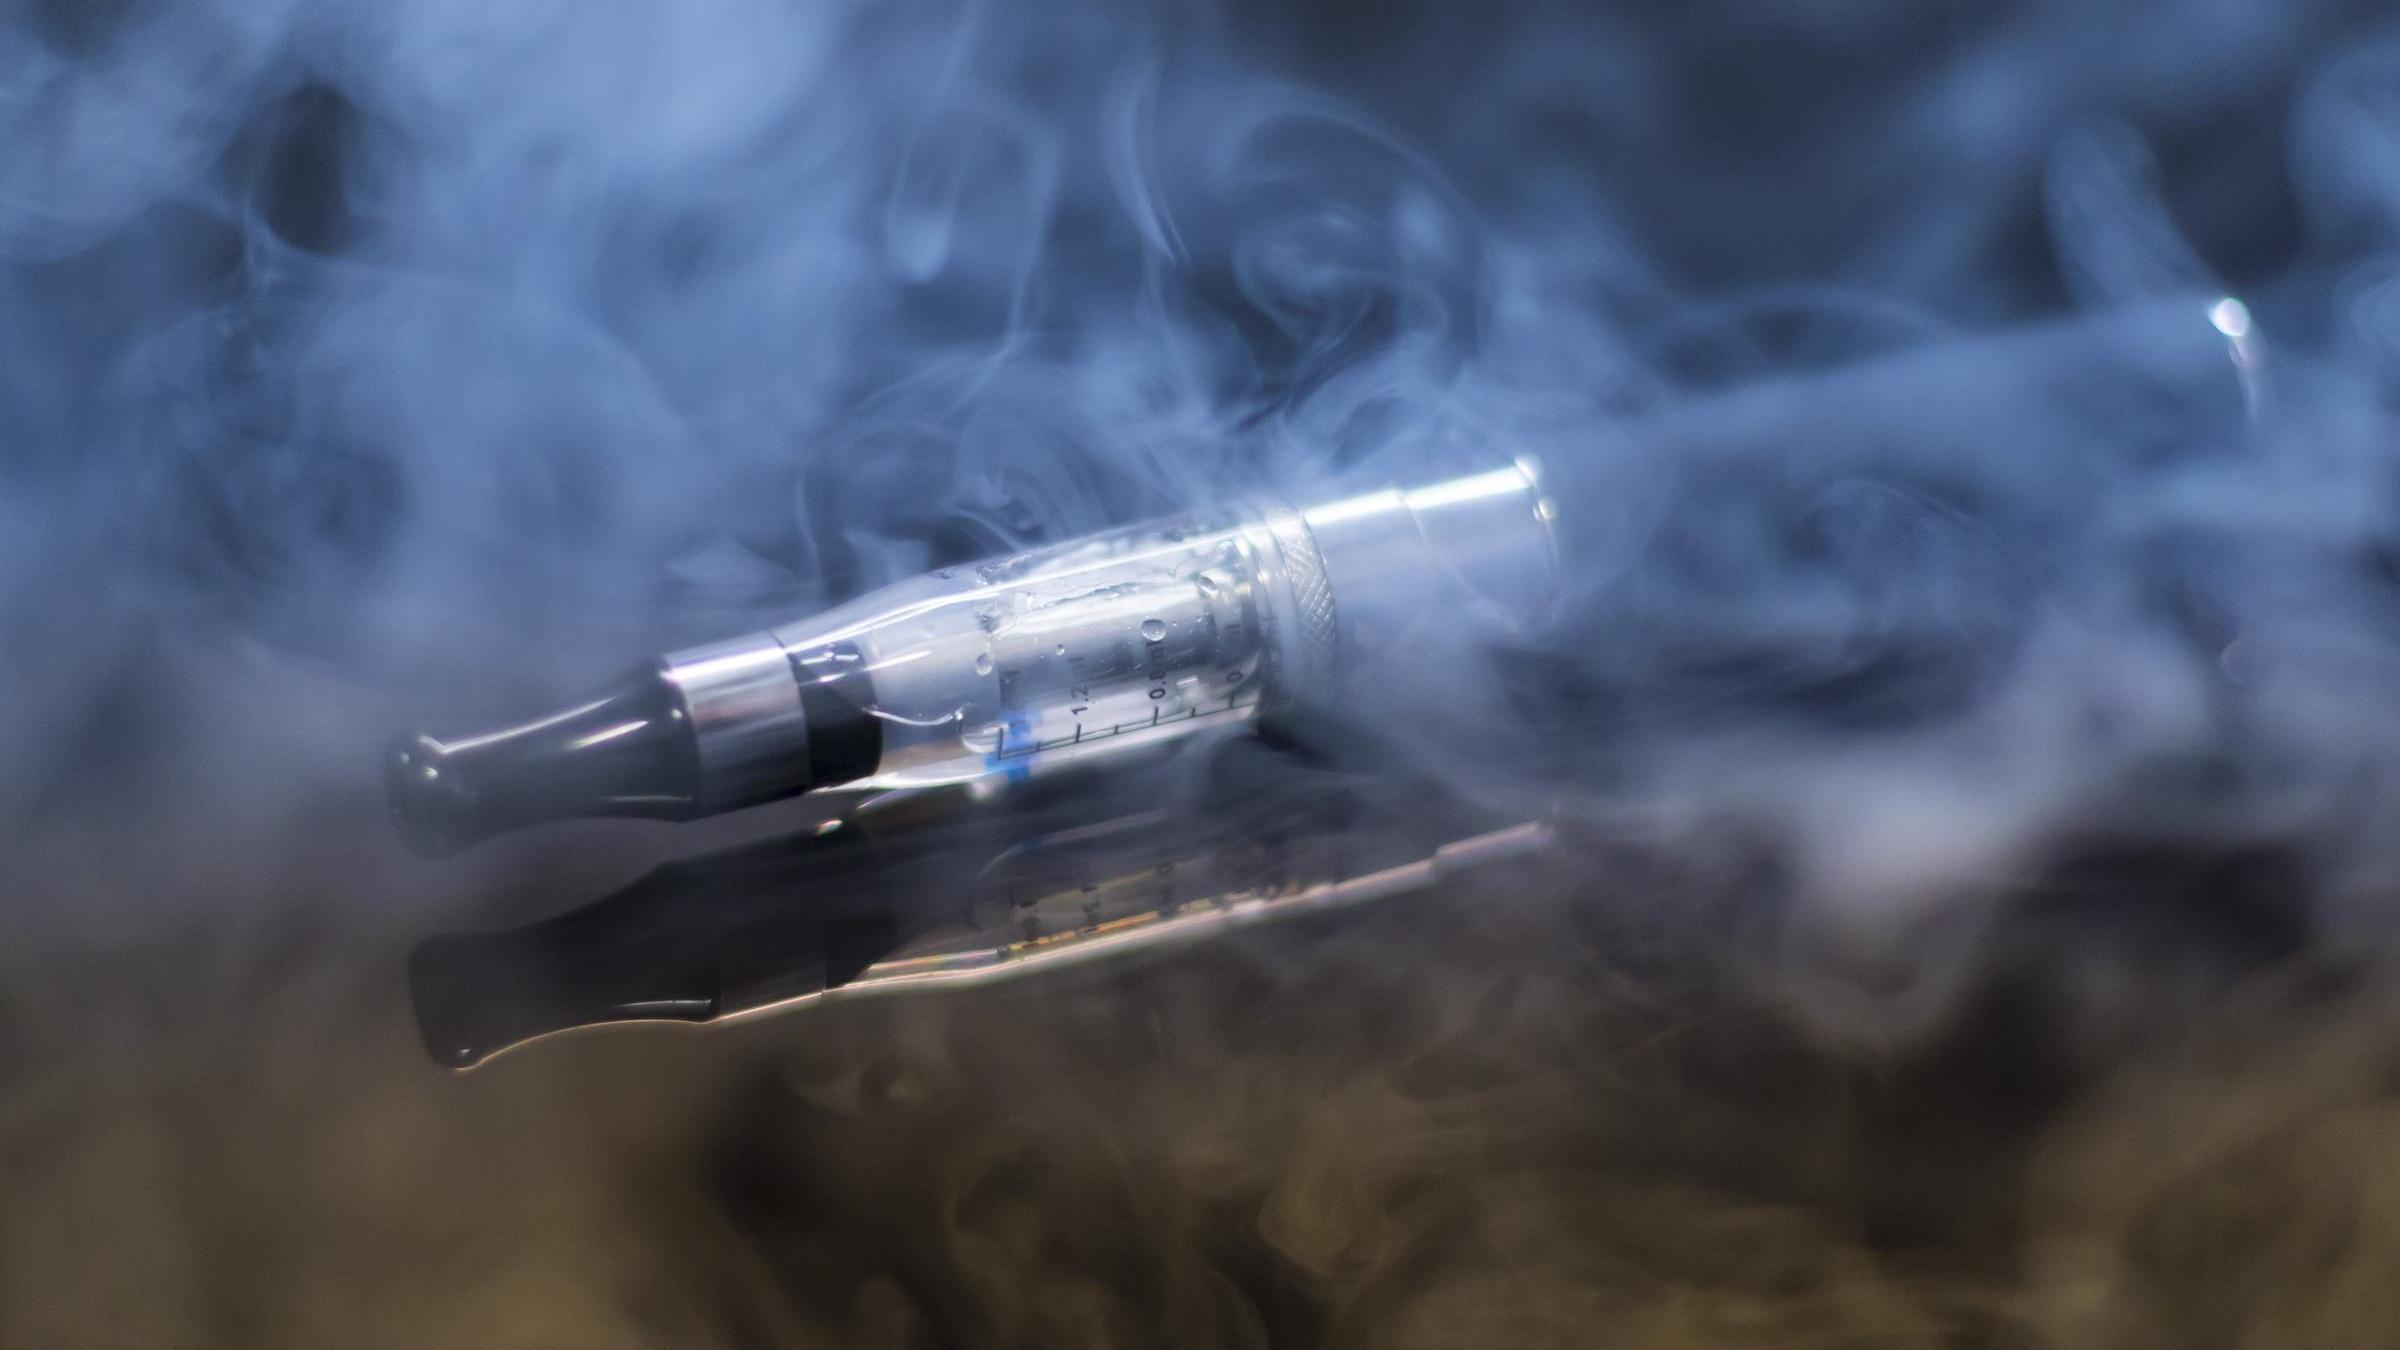 Электронные сигареты мешают противовирусному иммунитету